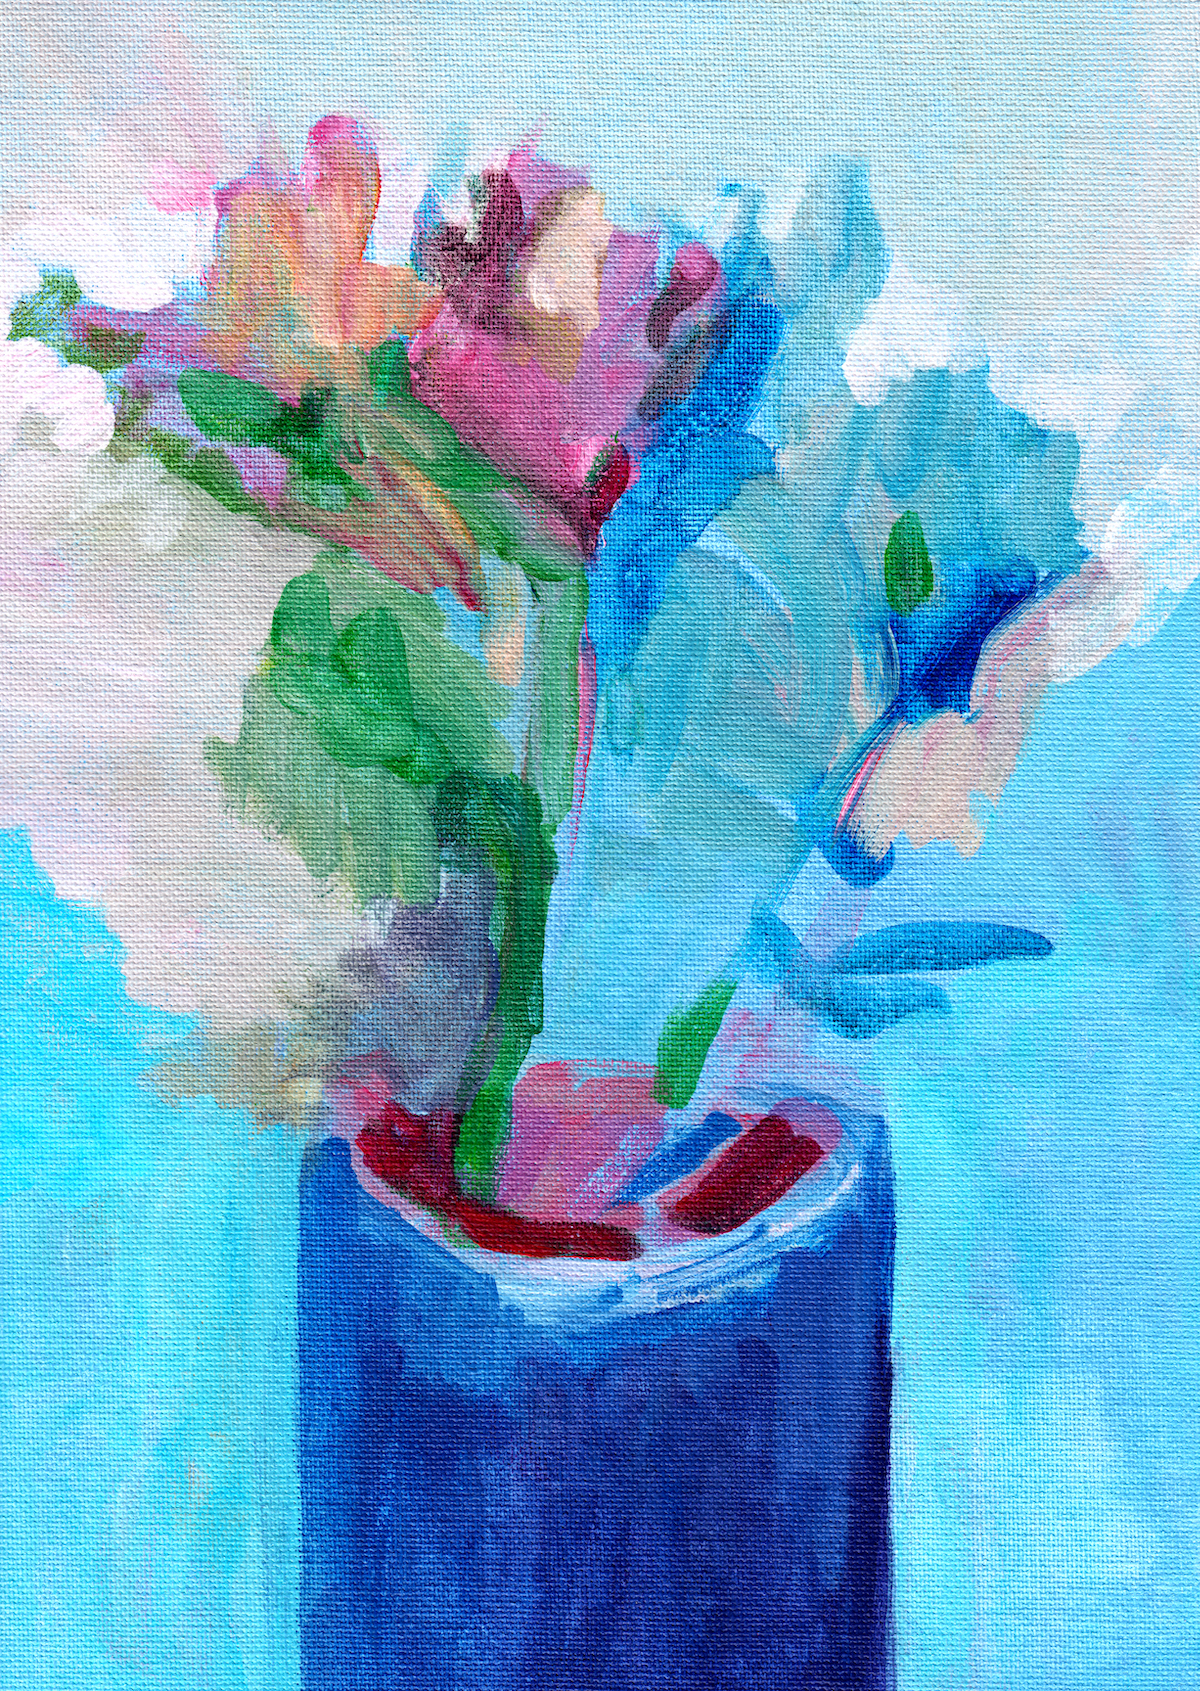 bali-painting-09-edited-2-1200.jpg